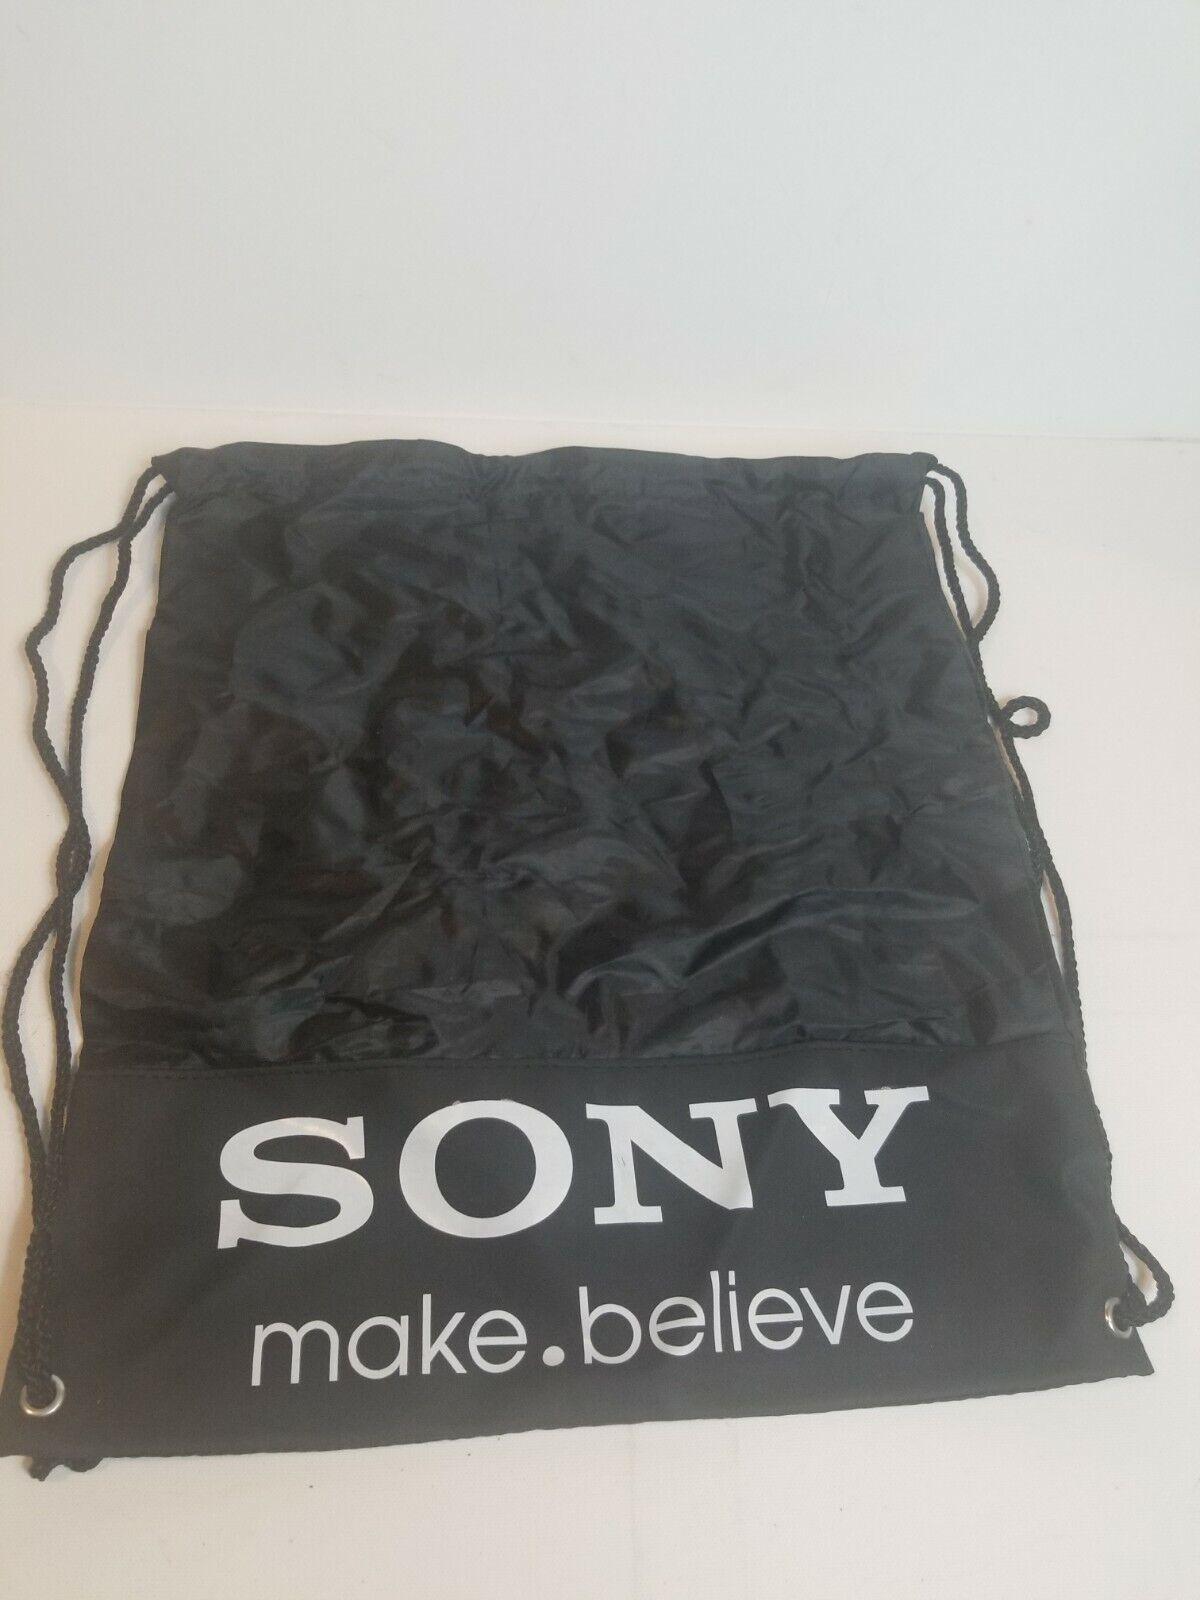 Sony Make Believe Rare Cinch Bag Sack Drawstring Black White Perfect Line